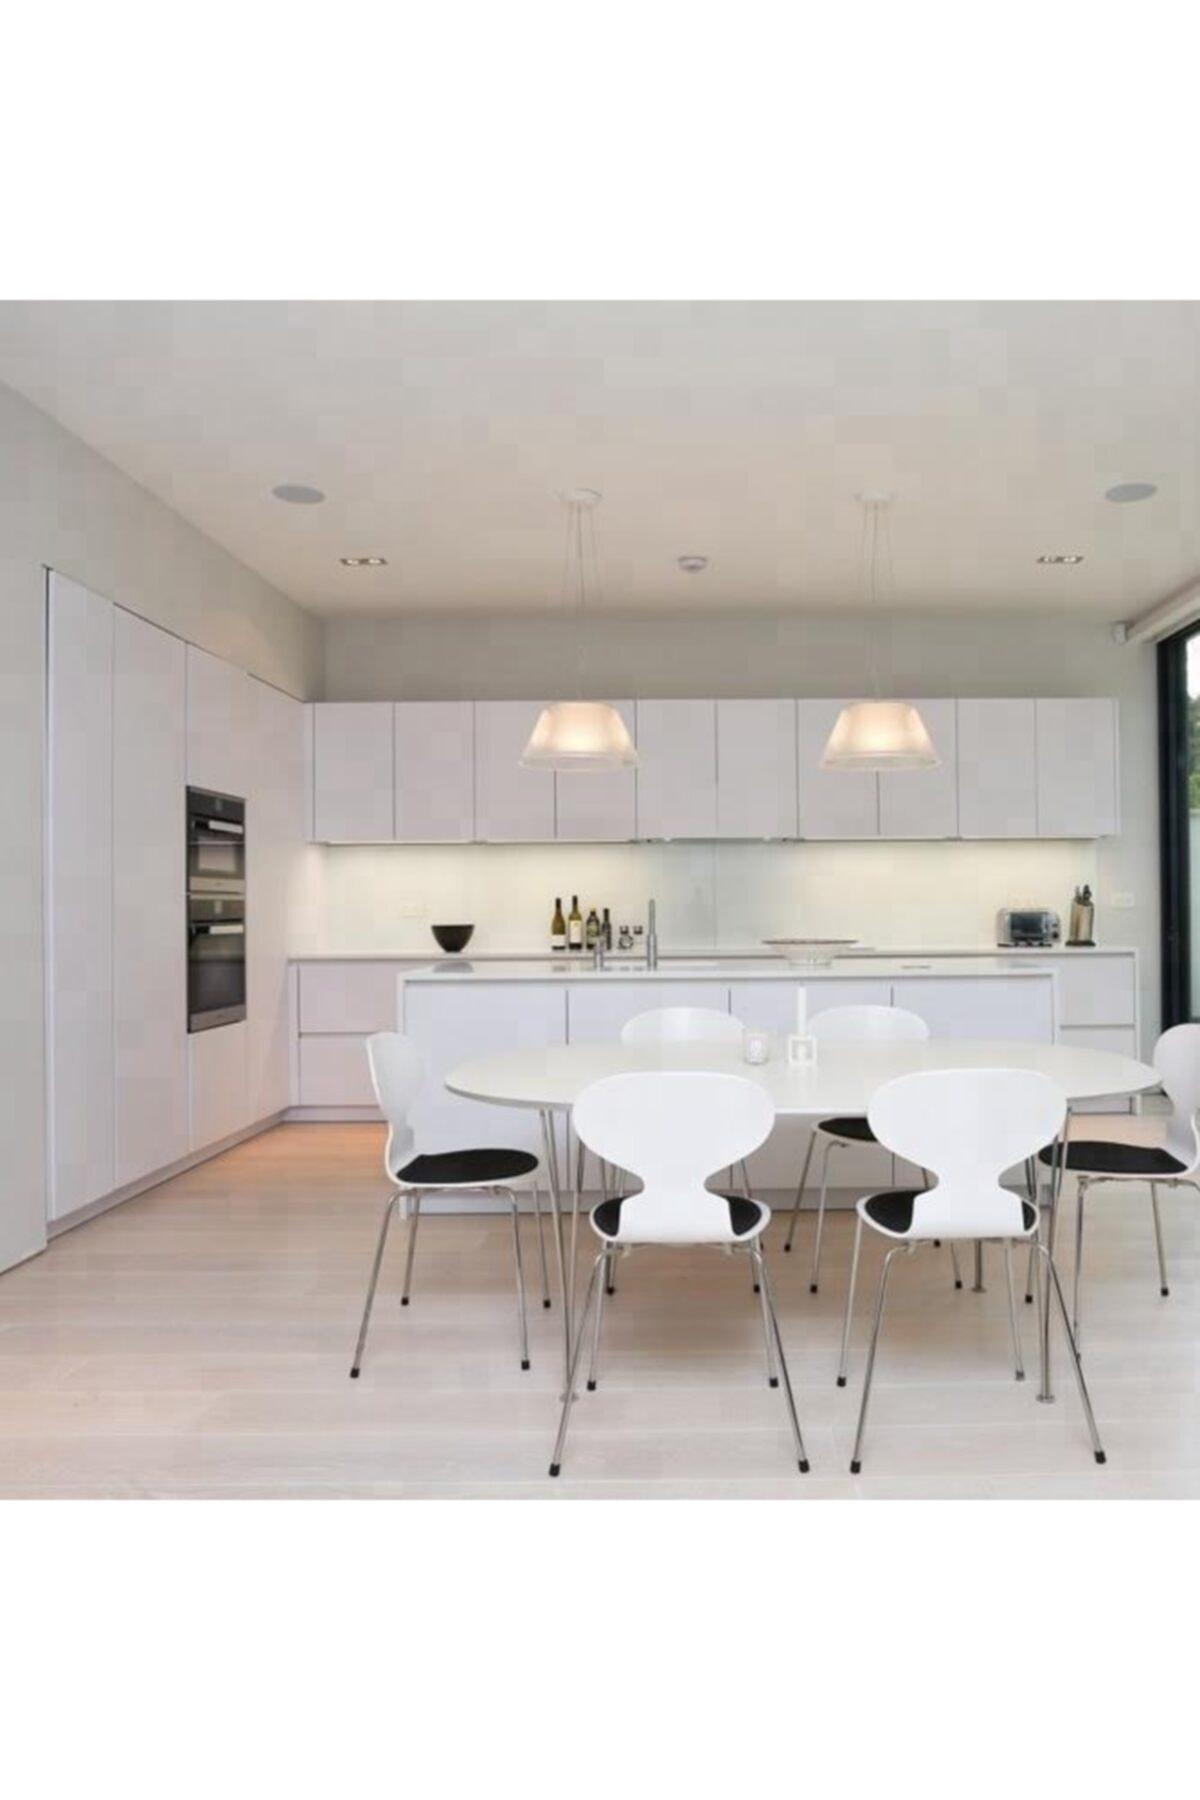 Parlak Beyaz Folyo - Dolap Kaplama Folyosu 50 Cm X 3 Metre